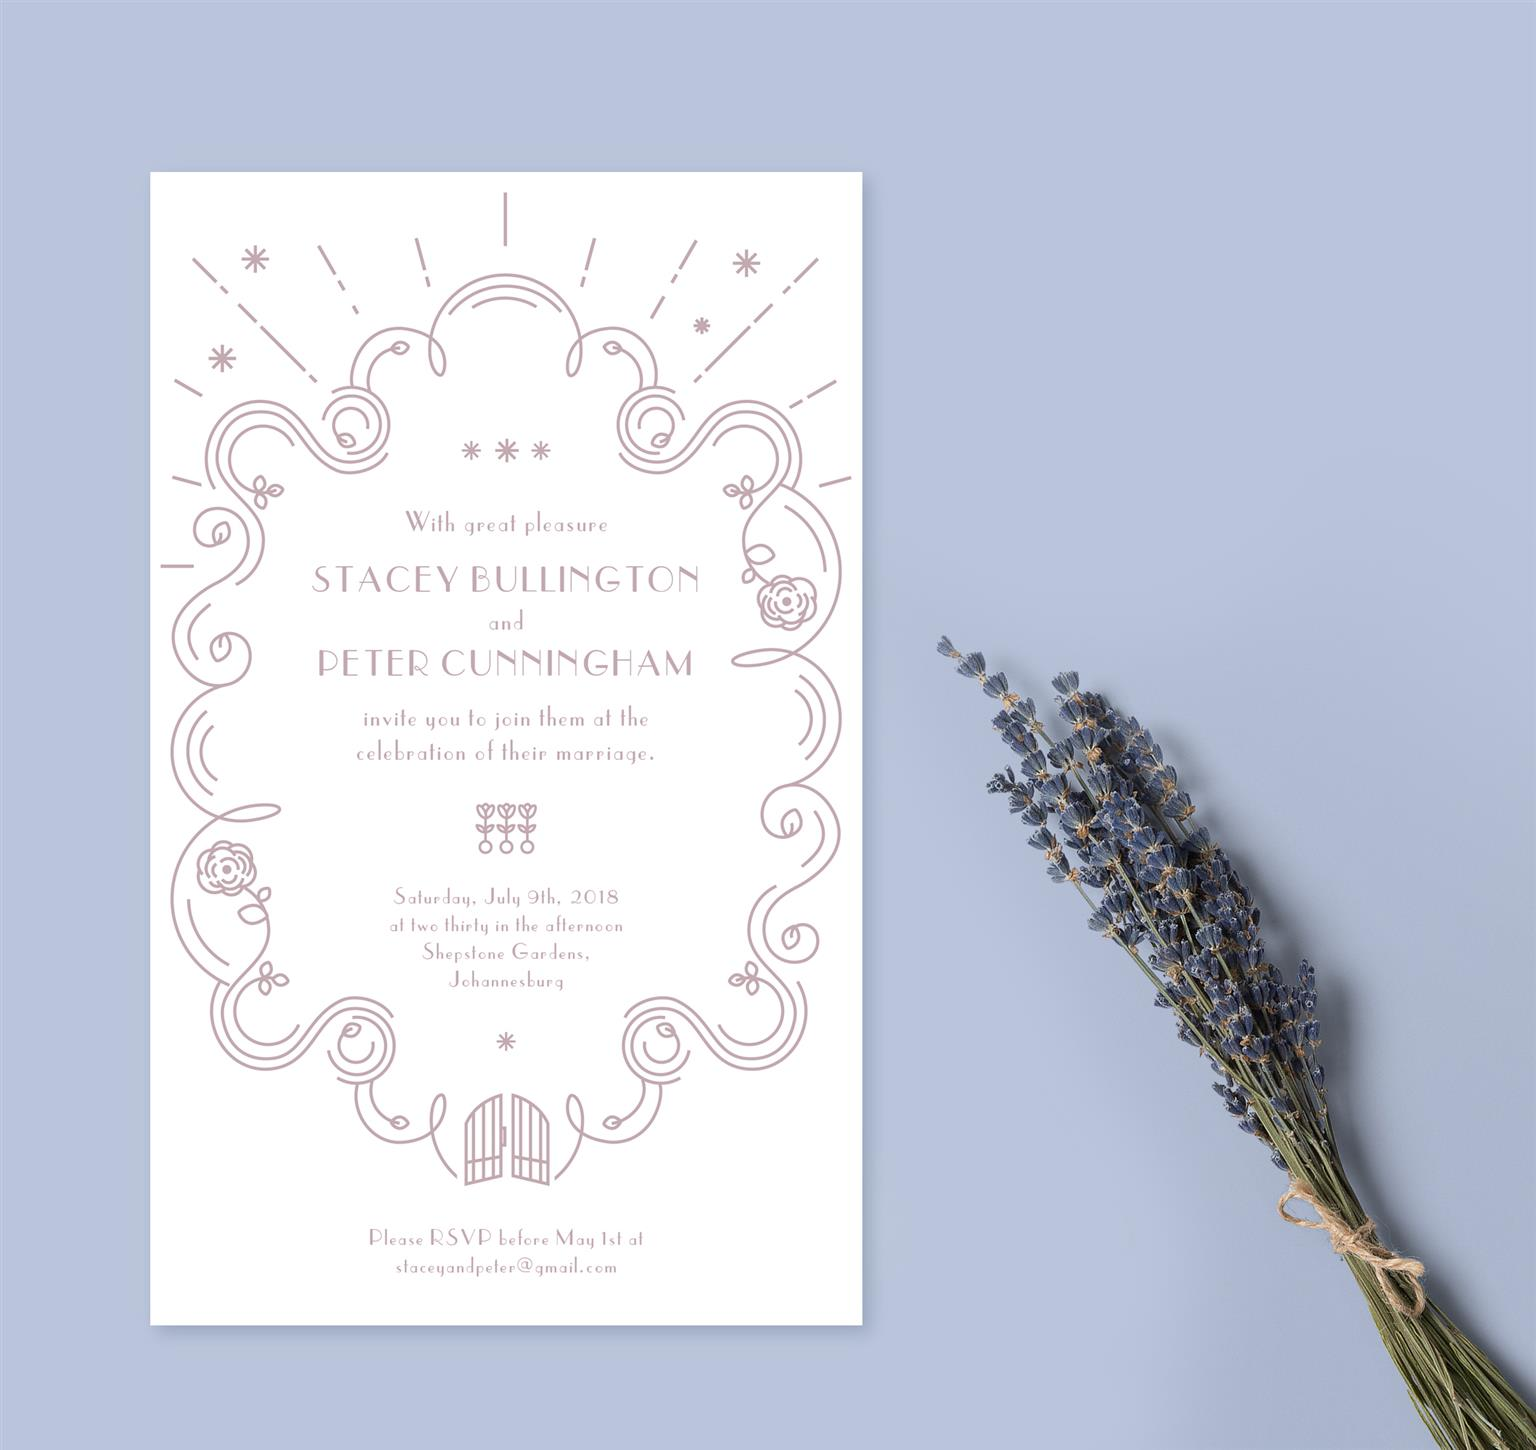 Wedding invitation design event invitation design junk mail wedding invitation design event invitation design stopboris Image collections